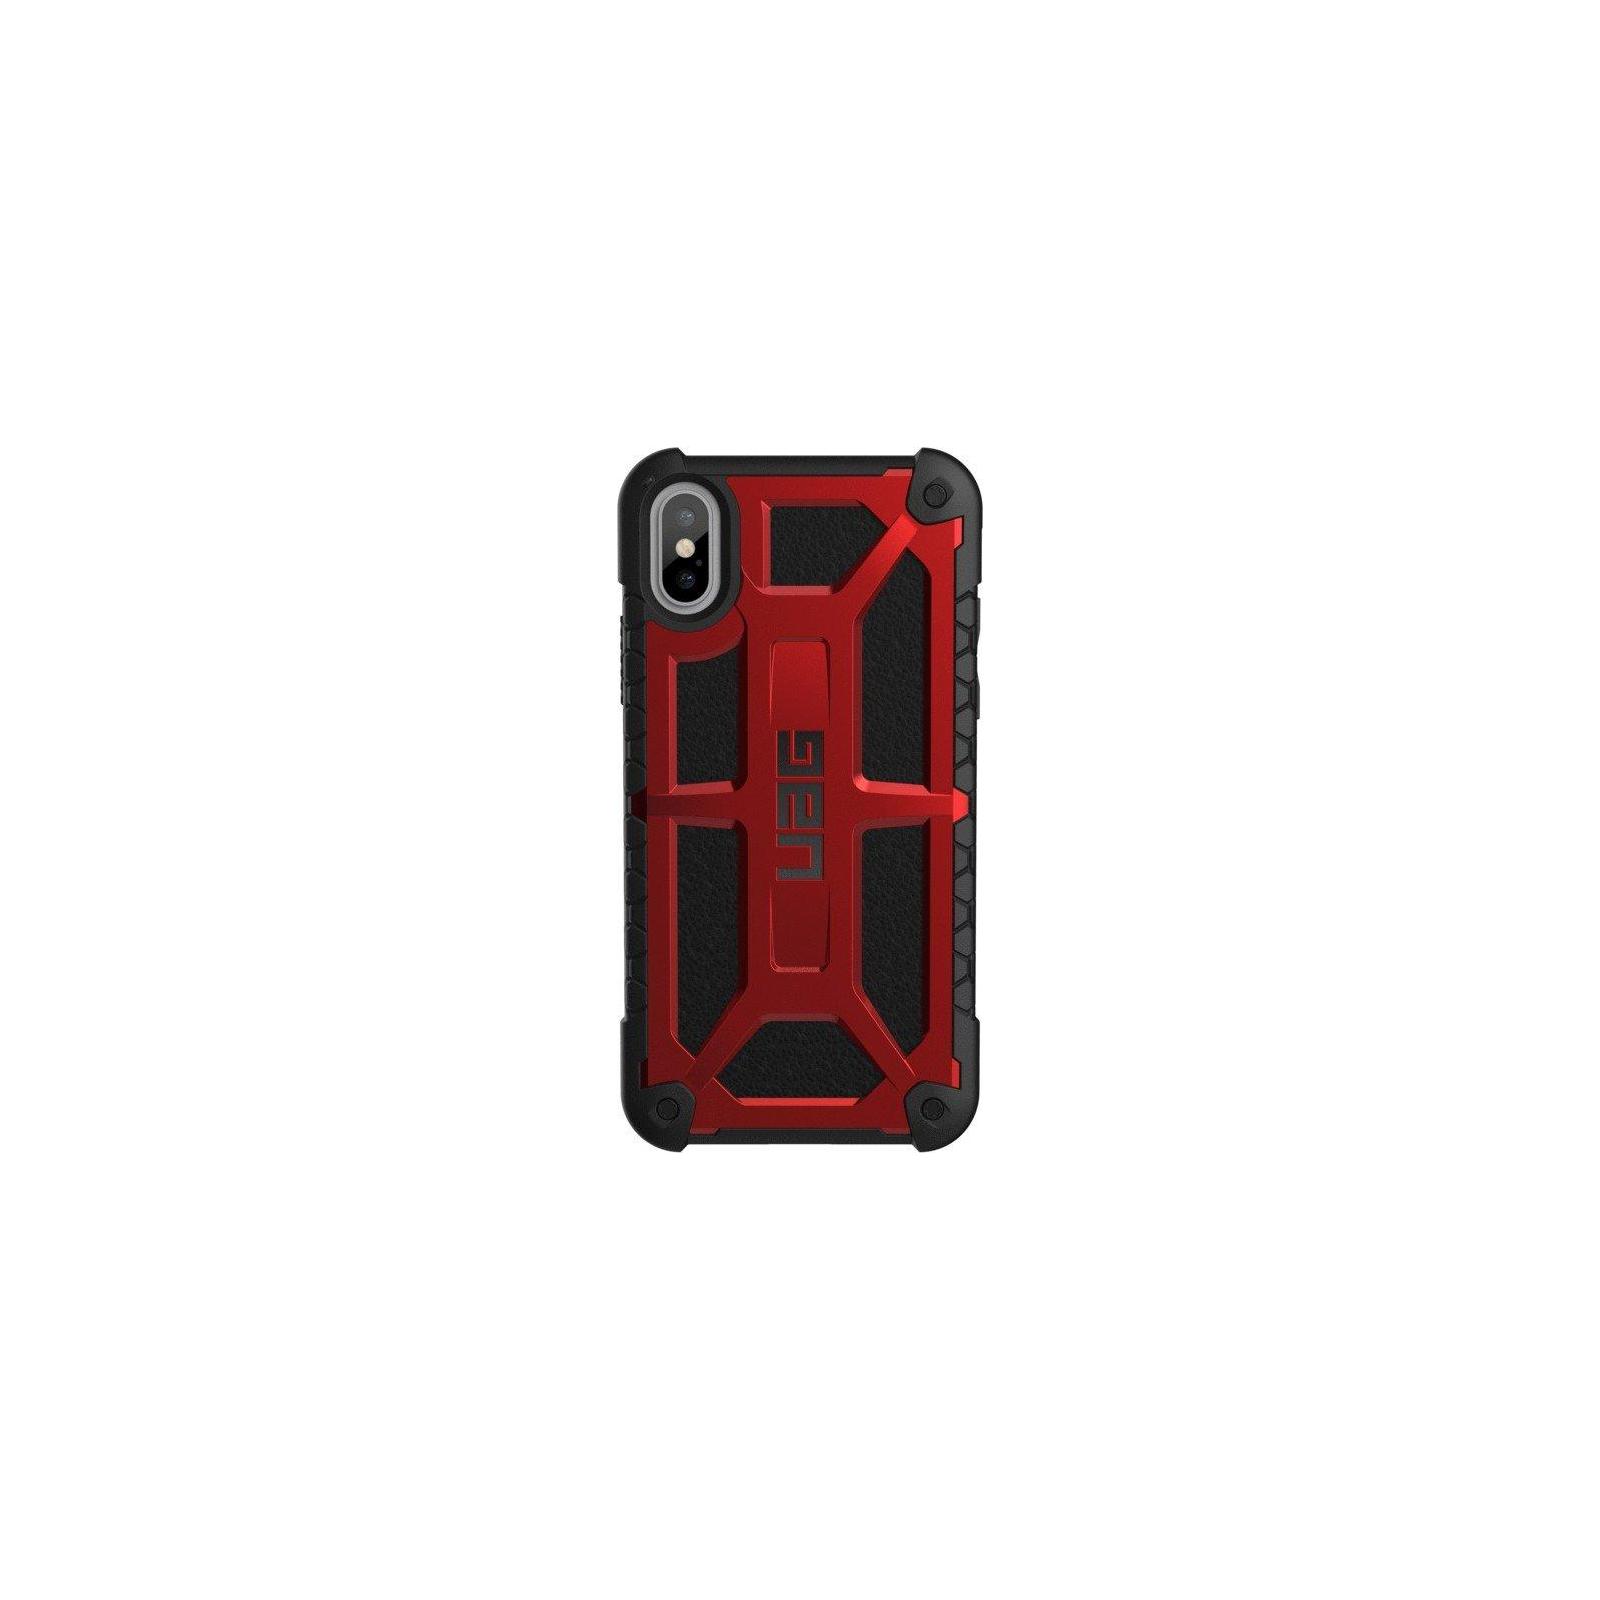 Чехол для моб. телефона Urban Armor Gear iPhone X Monarch Crimson (IPHX-M-CR)